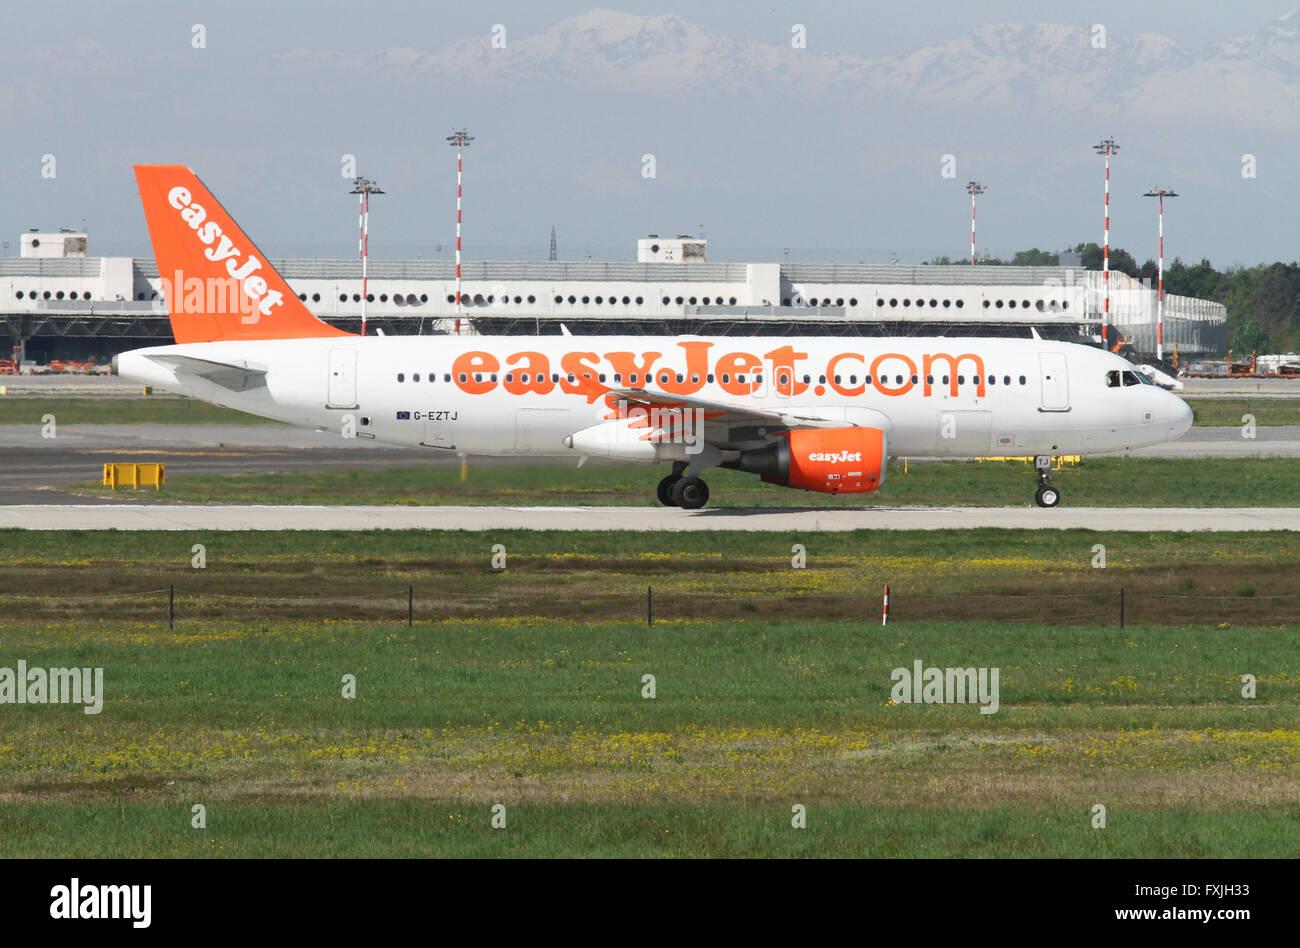 EasyJet, Airbus A320-214 at Linate airport, Milan, Italy - Stock Image